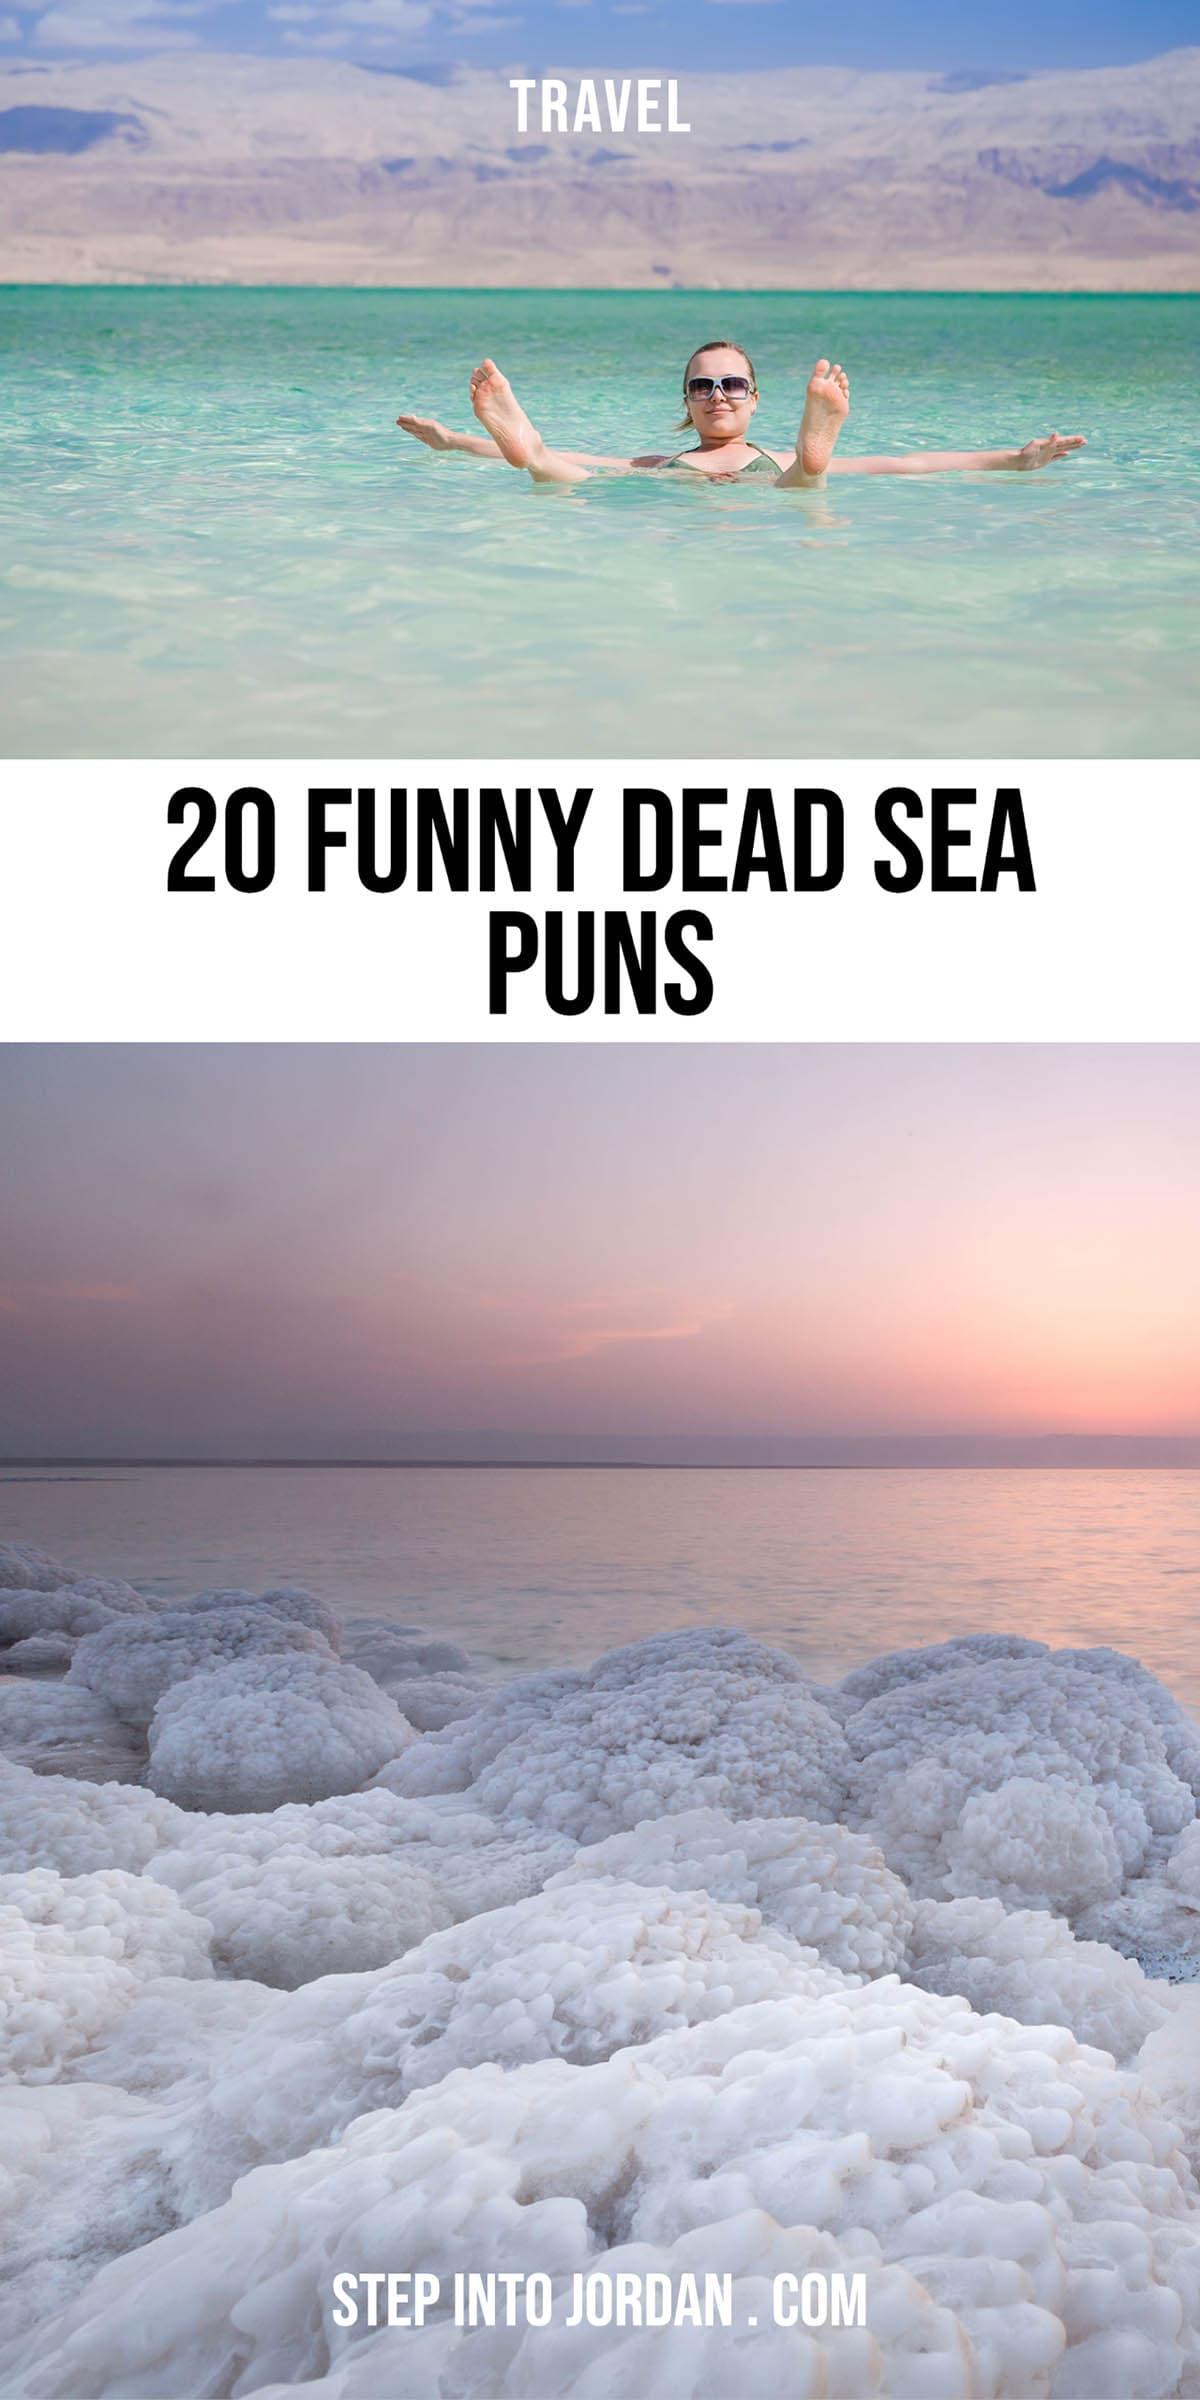 Dead Sea Puns.